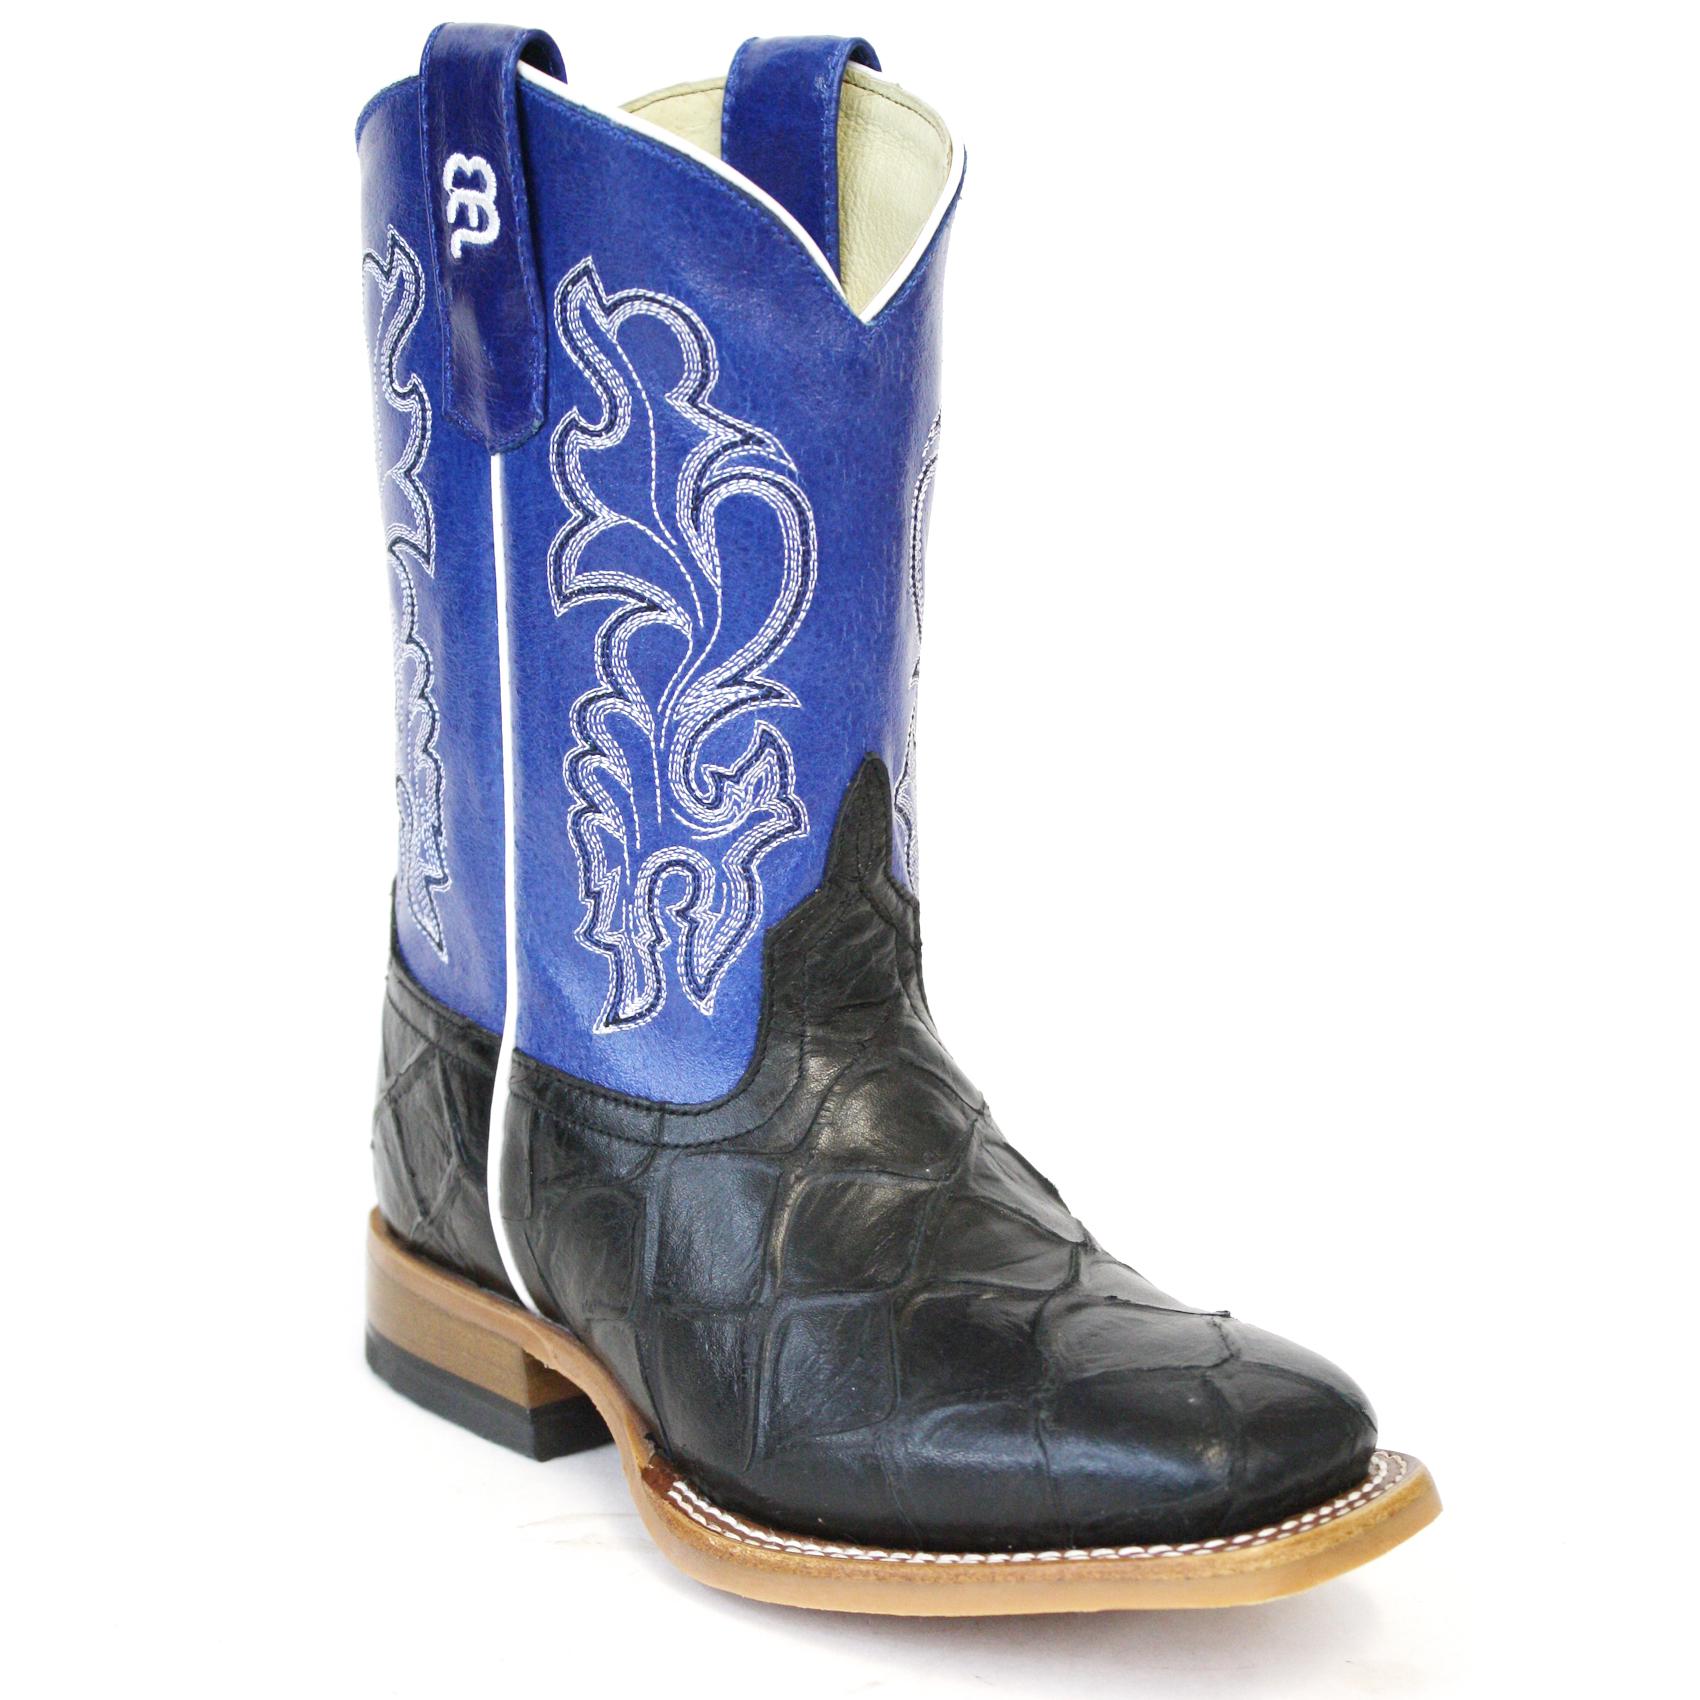 Childs Blue Black Round Toe Faux Leather Cowboy Boots Cushion Insoles SALE!!